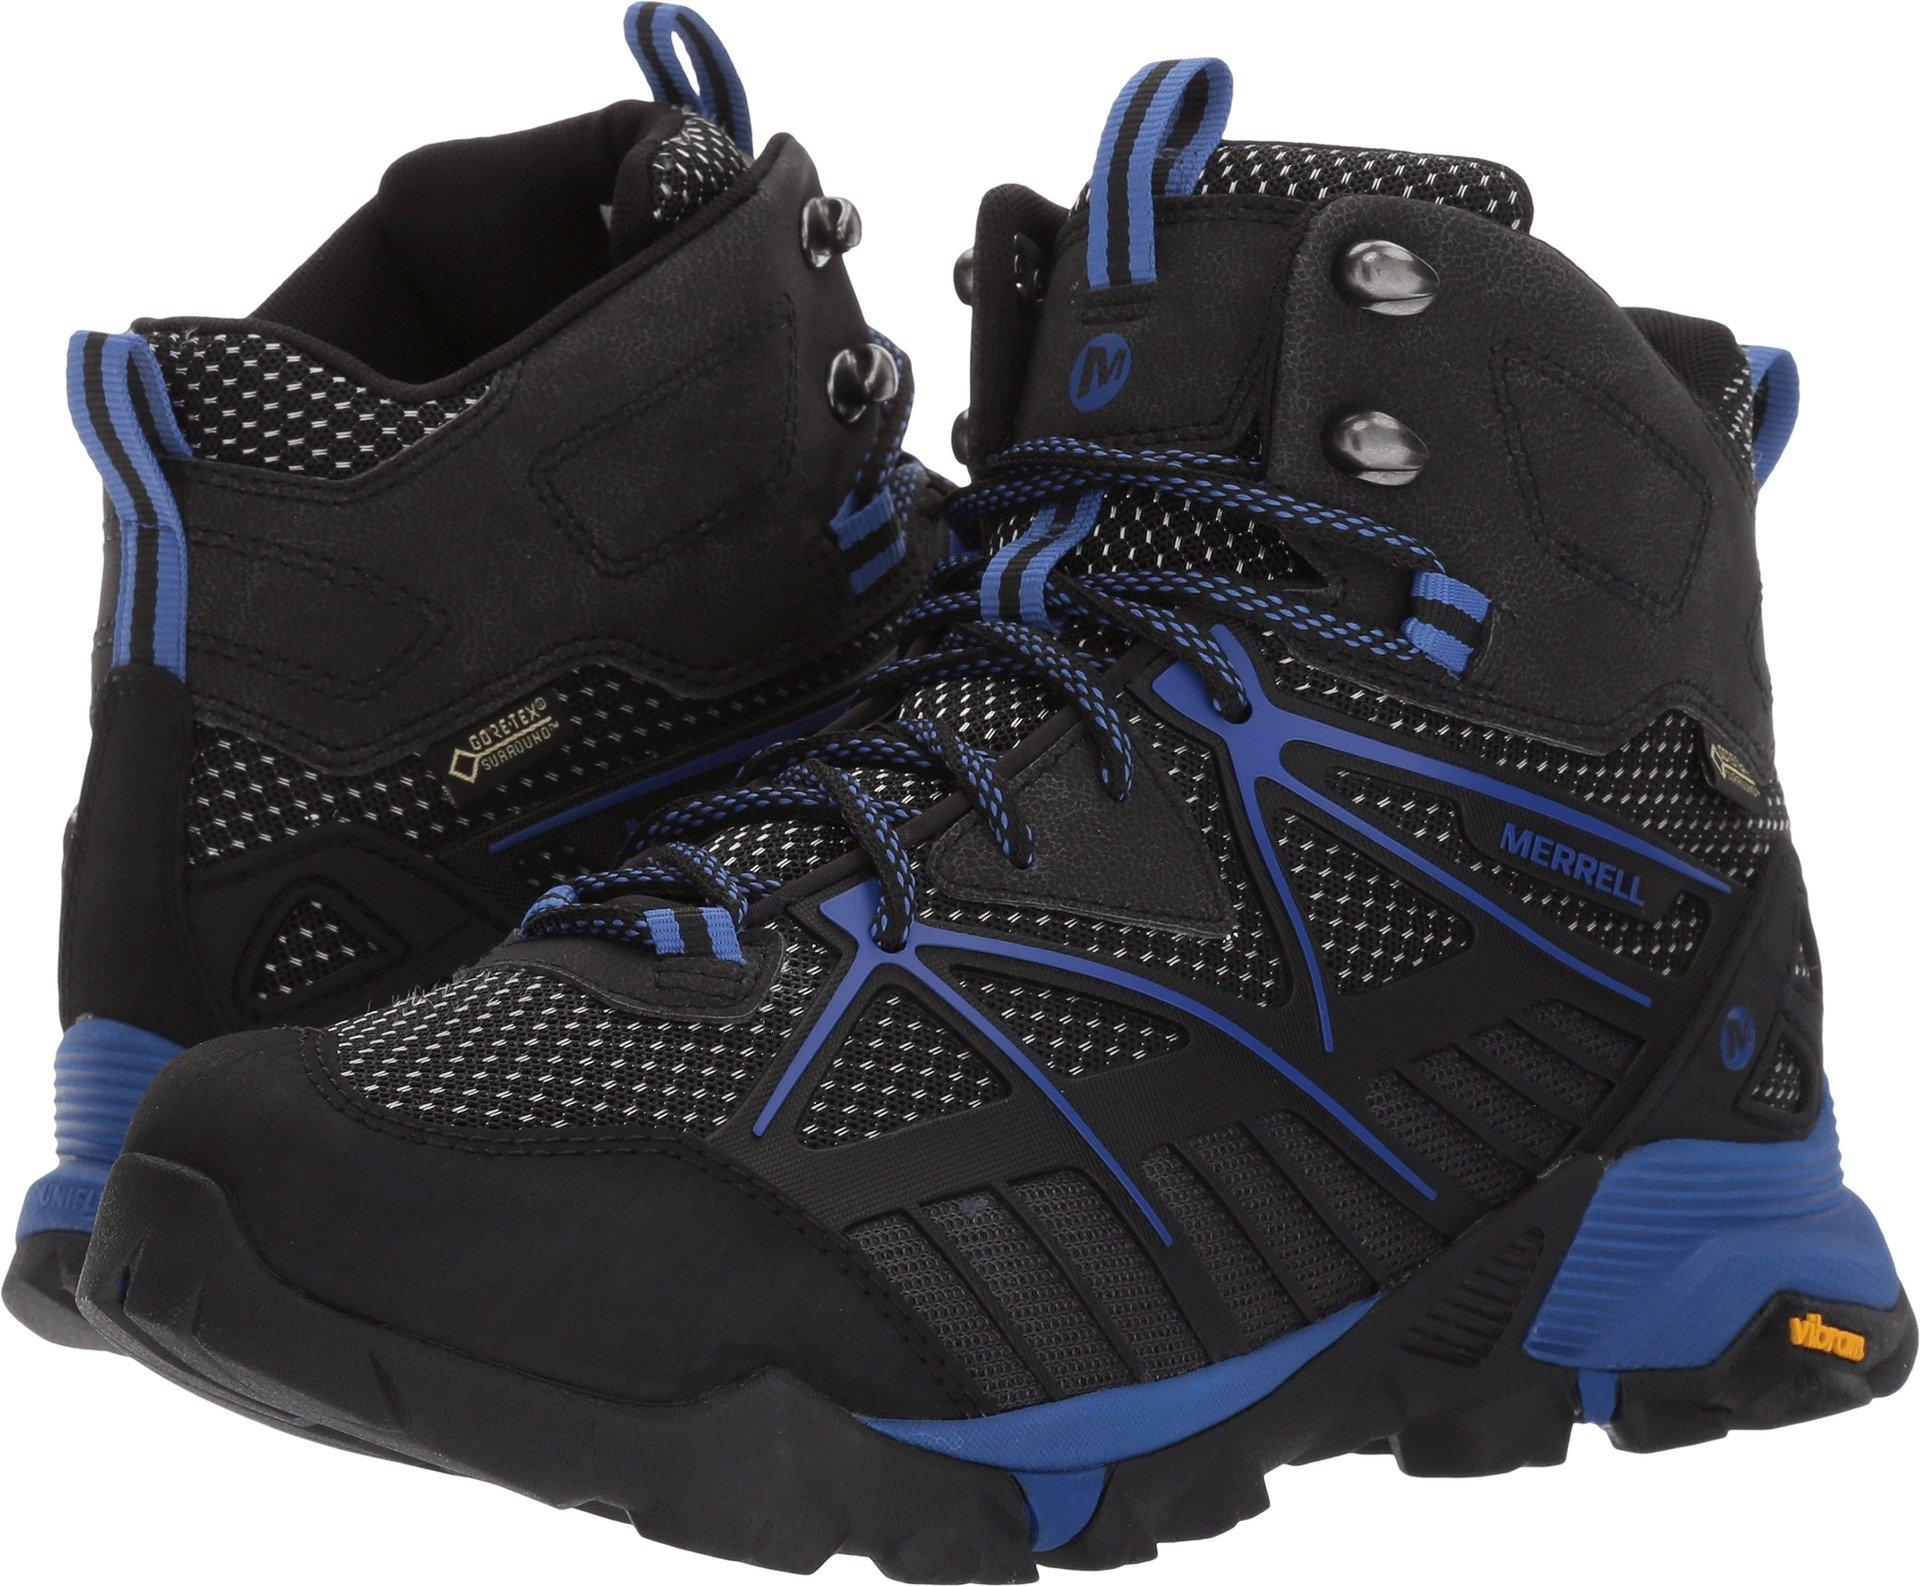 Merrell Capra Venture Mid Gore-Tex Surround Boot - Women's Black 5.5